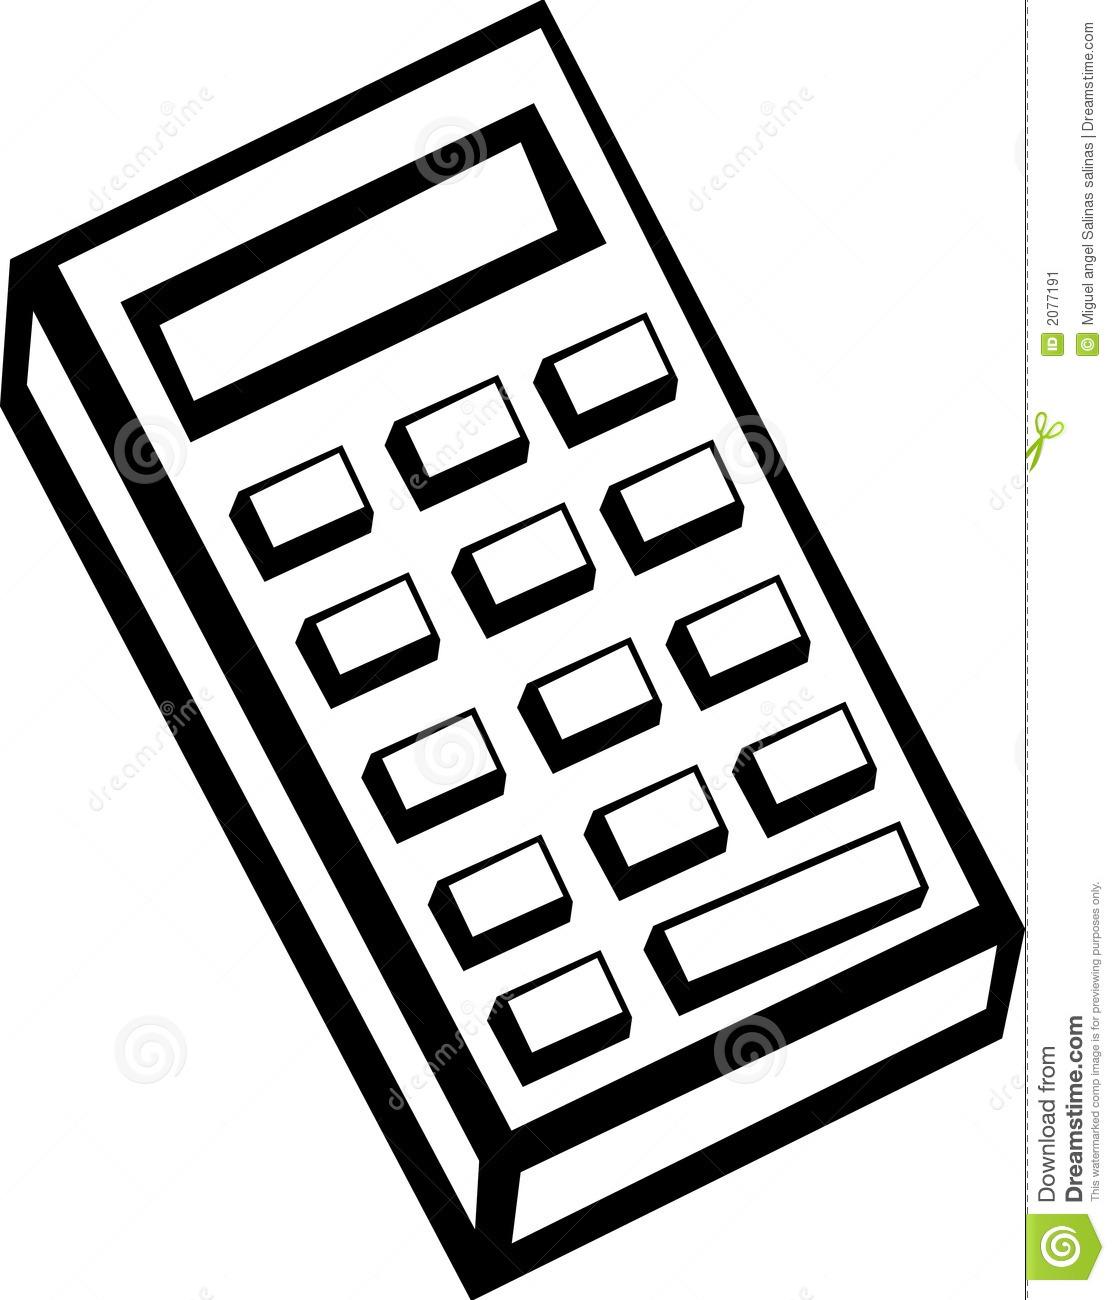 1115x1300 Calculator Clipart 23130 Clip Art Graphic Of A Calculator Cartoon